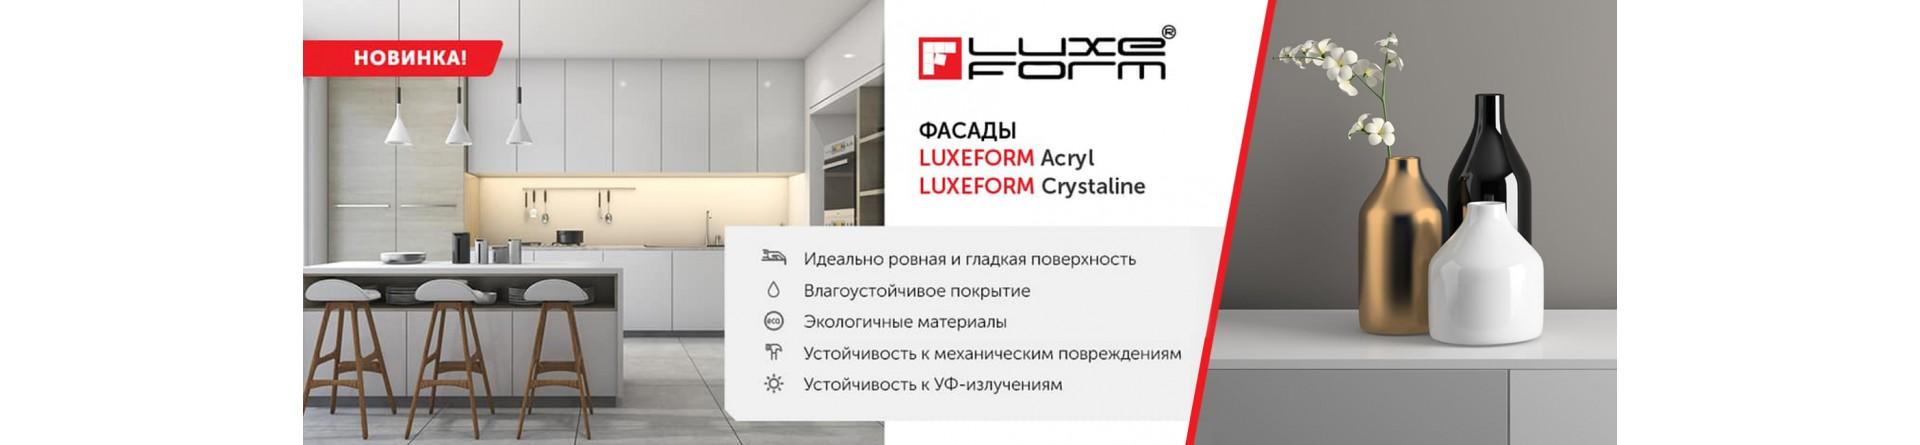 Luxeform Acryl Crystaline - Мебель Комплект